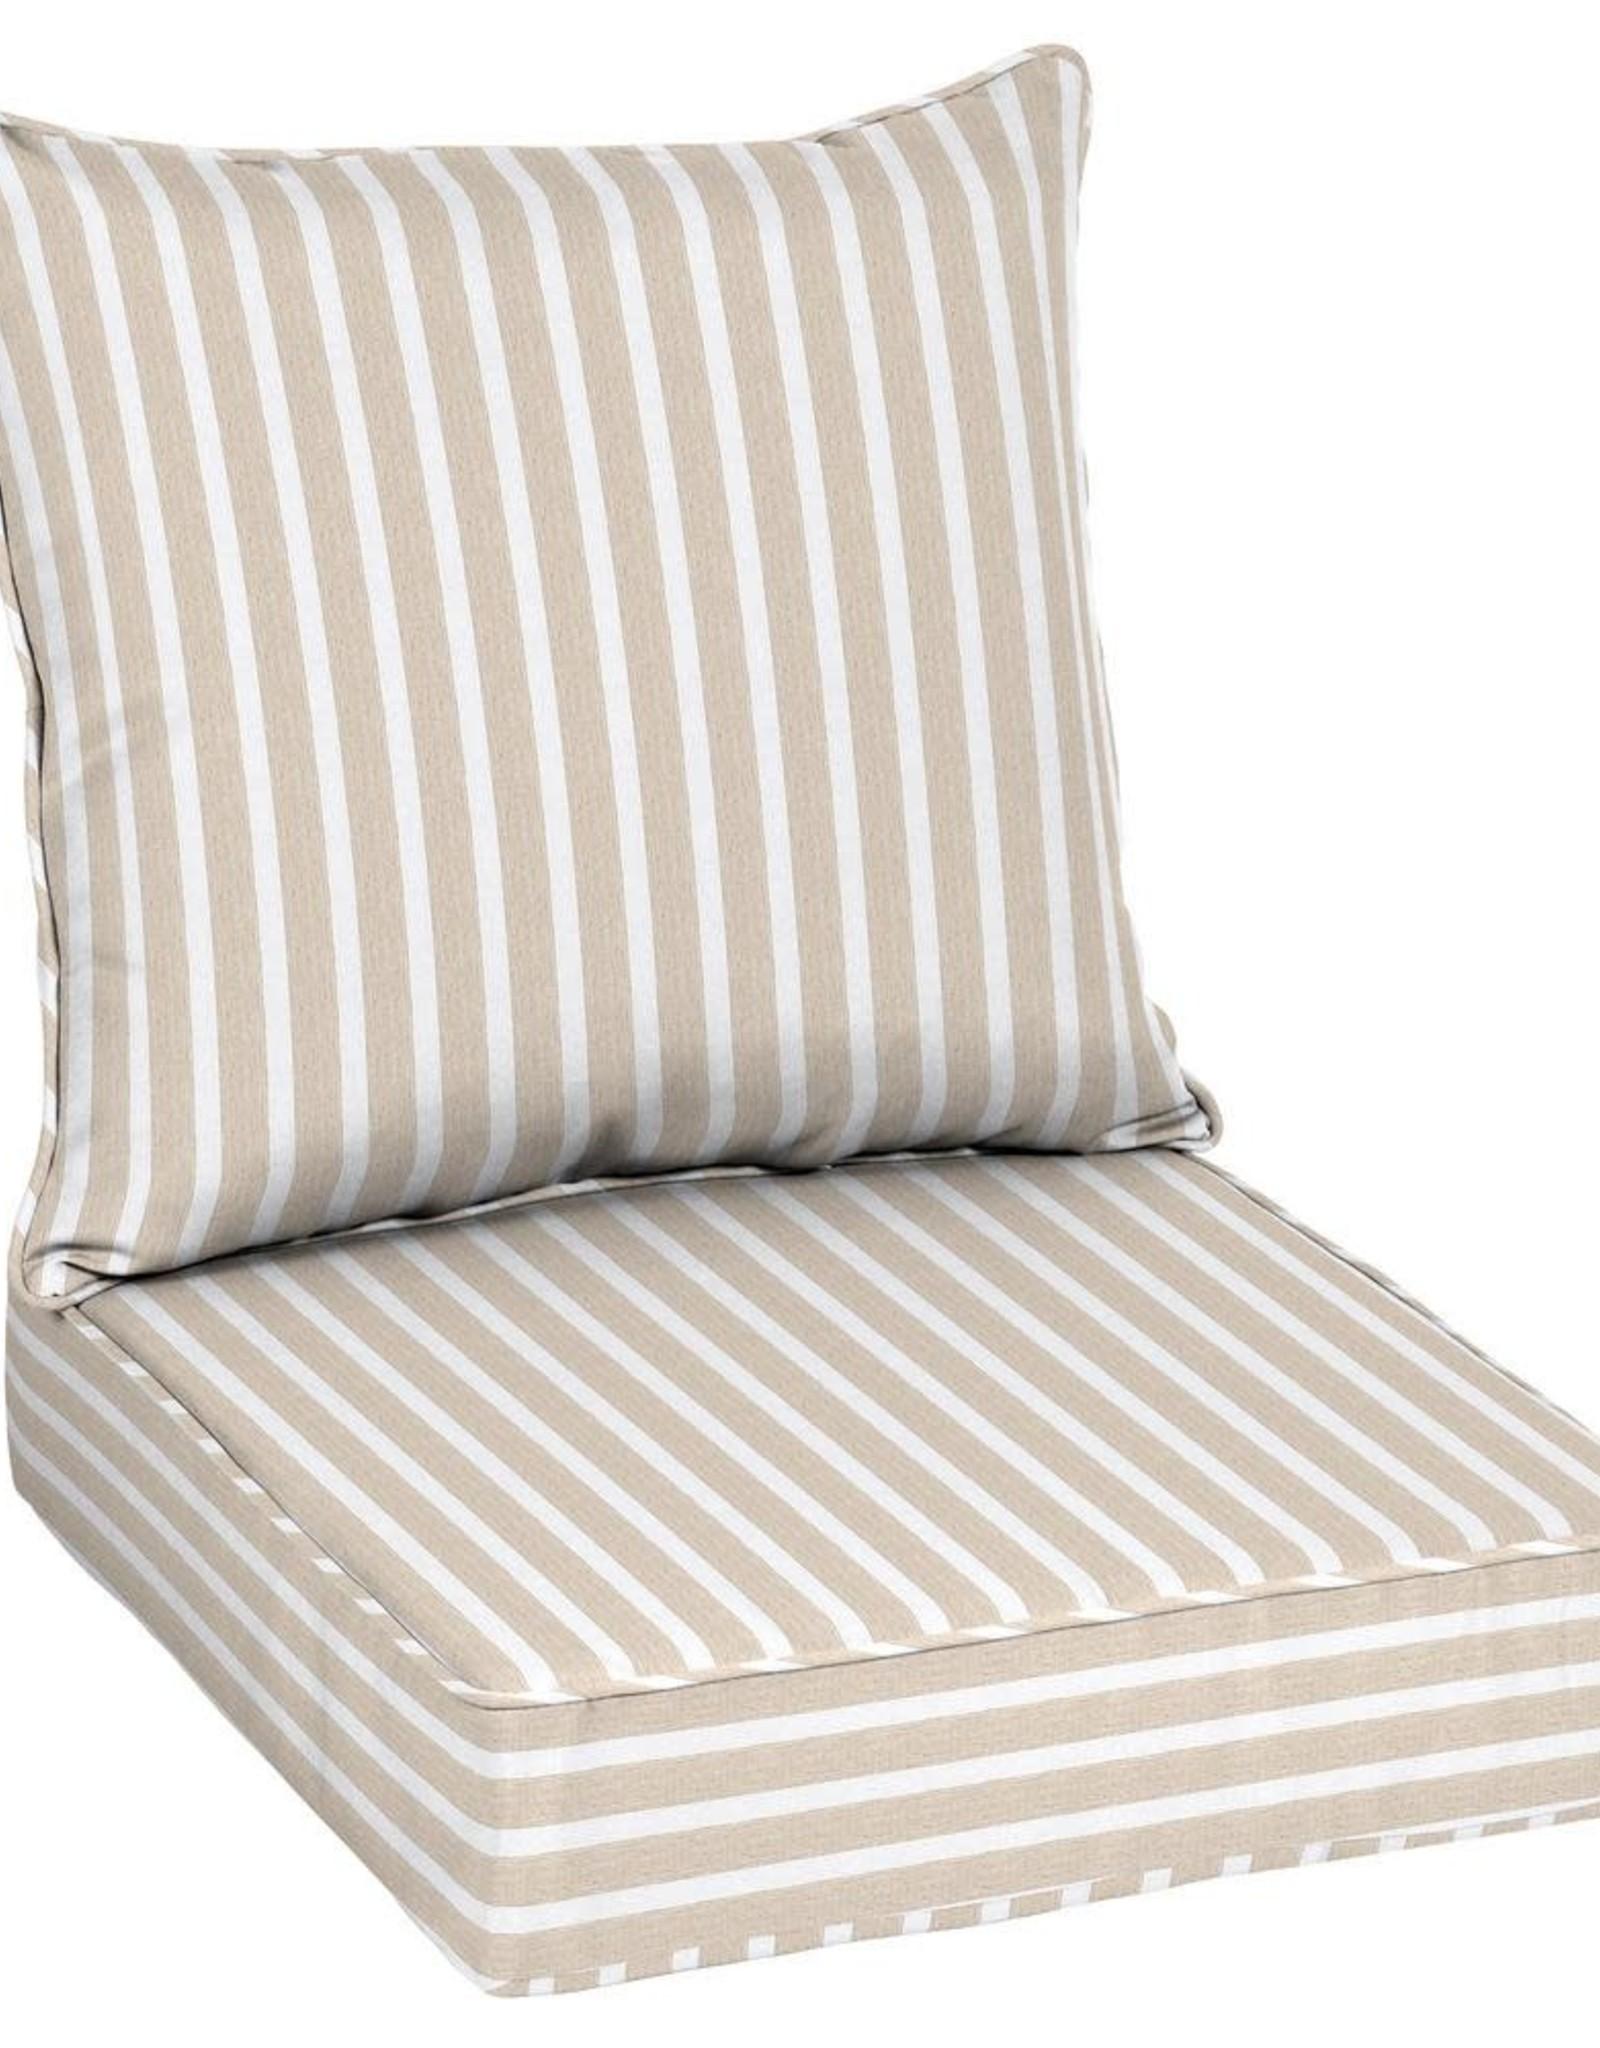 Home Decorators Collection 24 x 24 Sunbrella Shore Linen Deep Seating Outdoor Lounge Chair Cushion